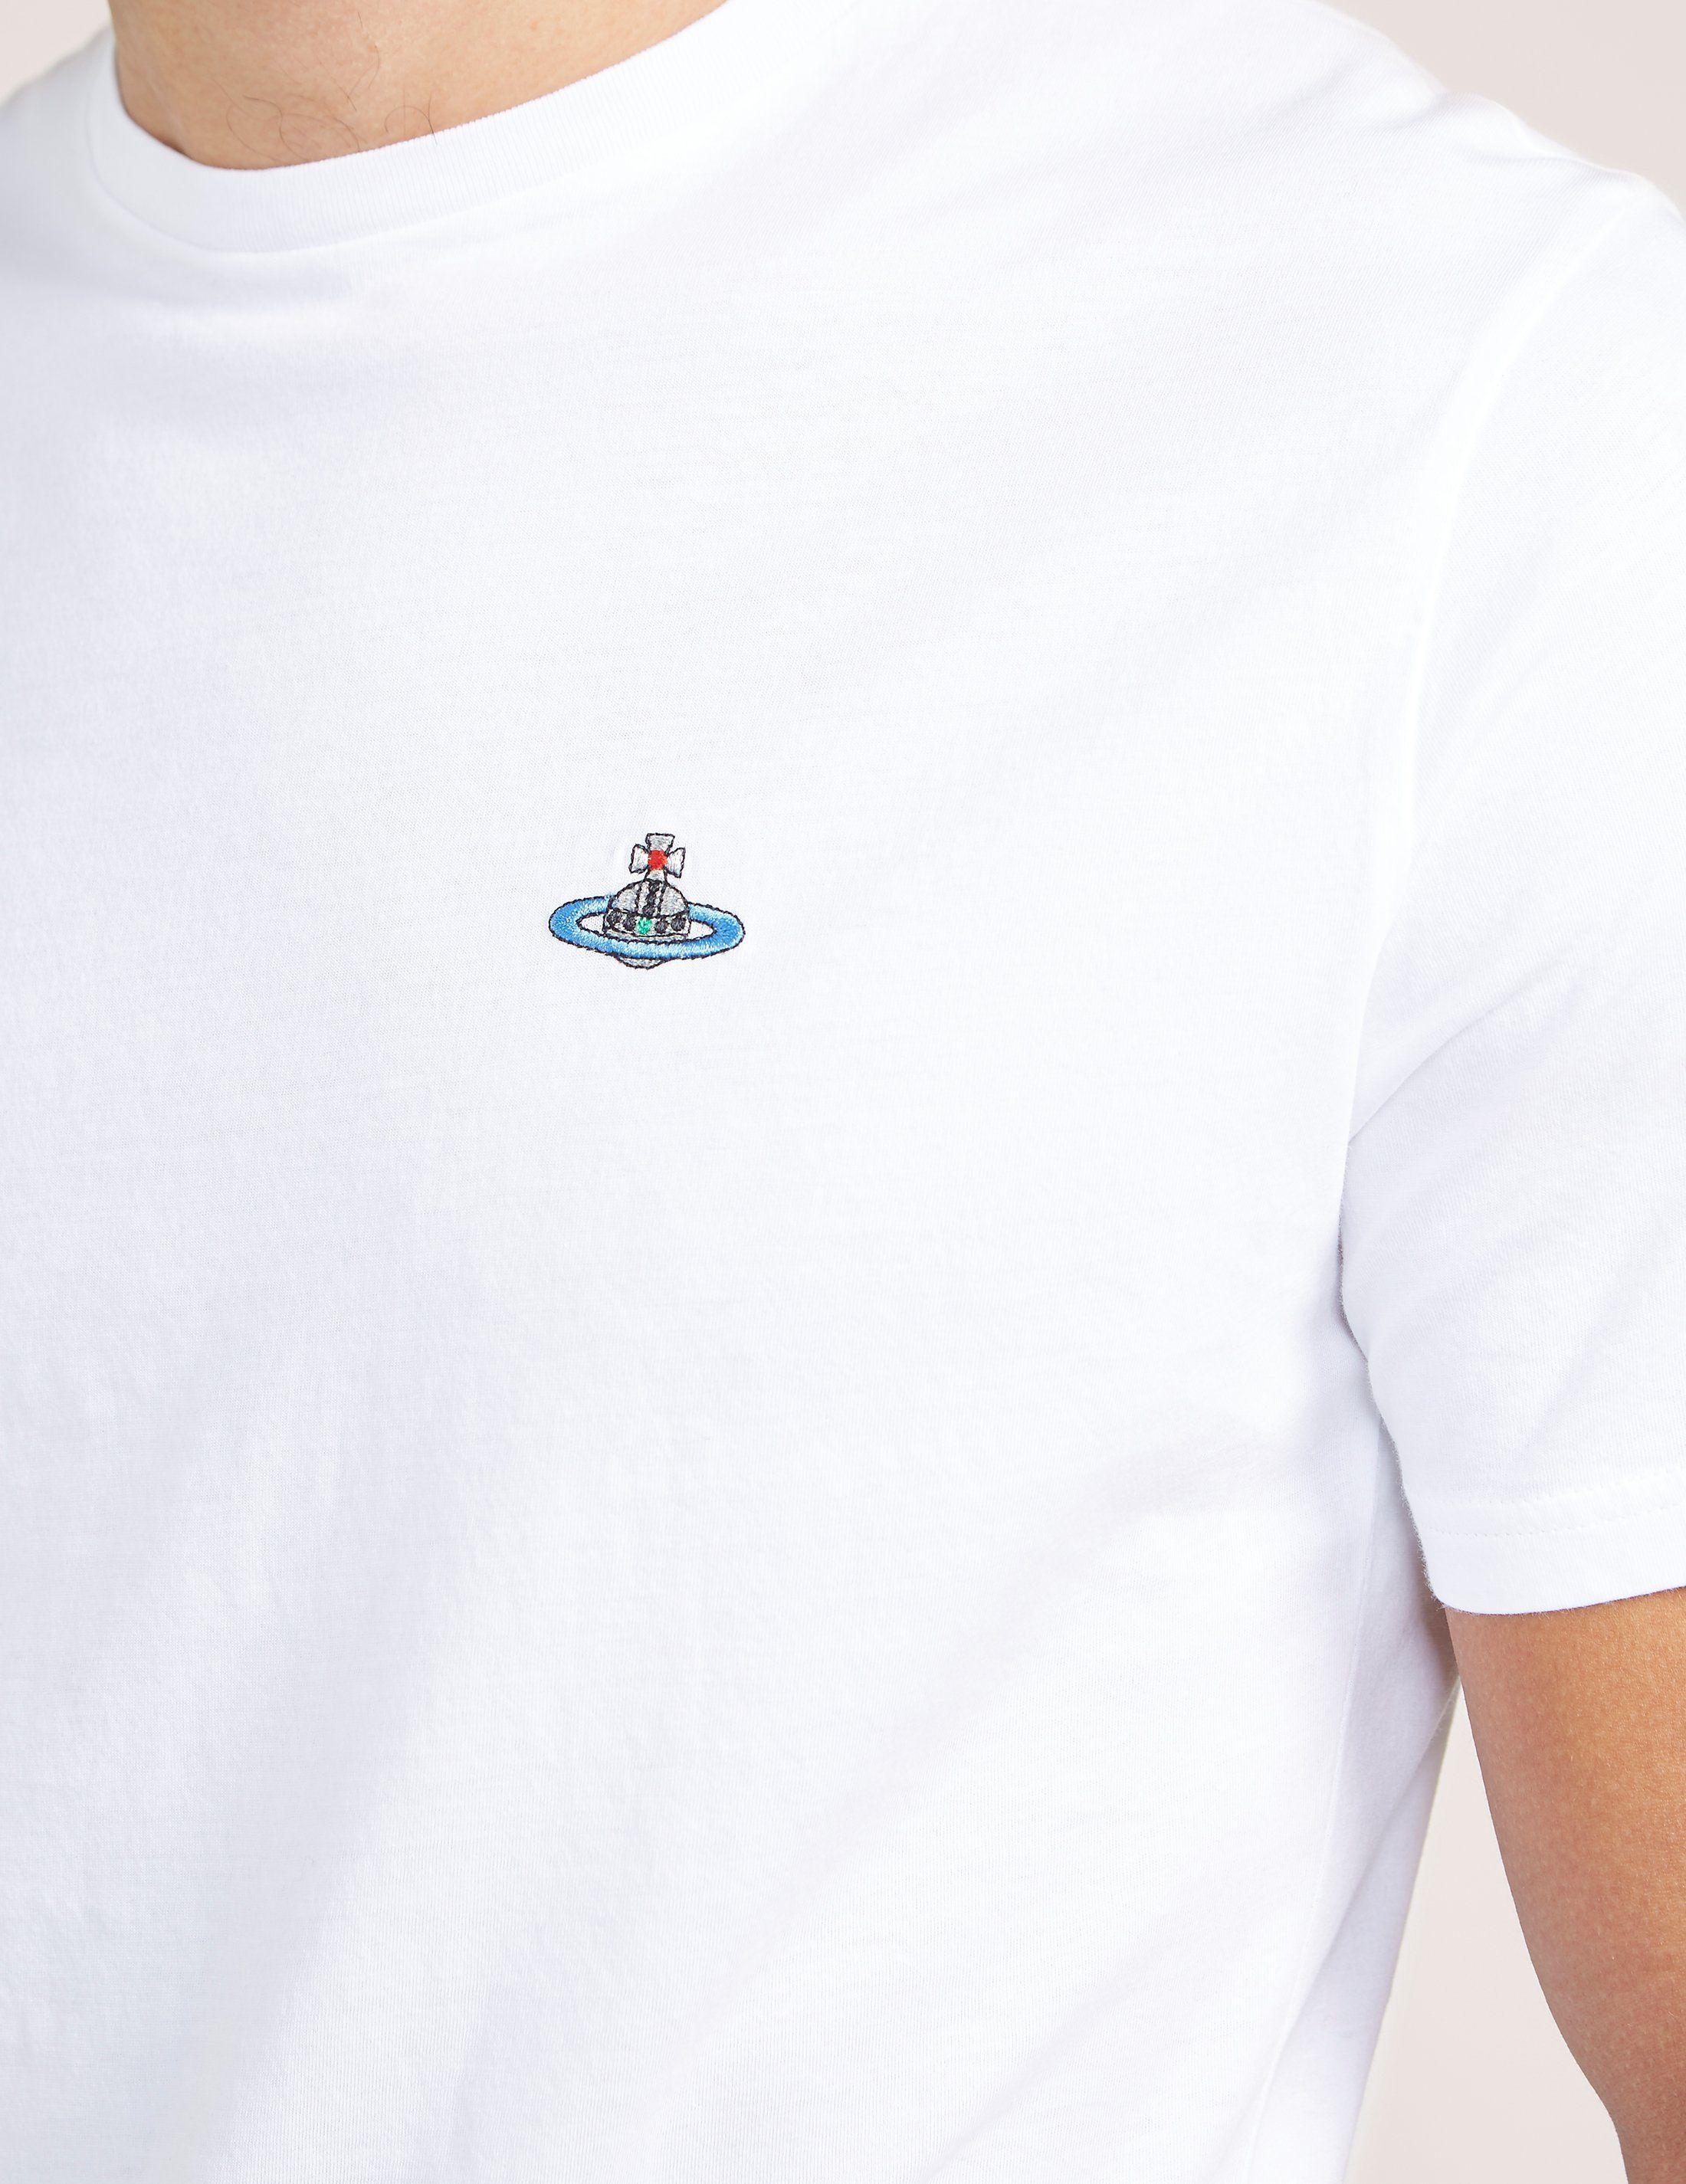 Vivienne Westwood Chest Orb Short Sleeve T-Shirt